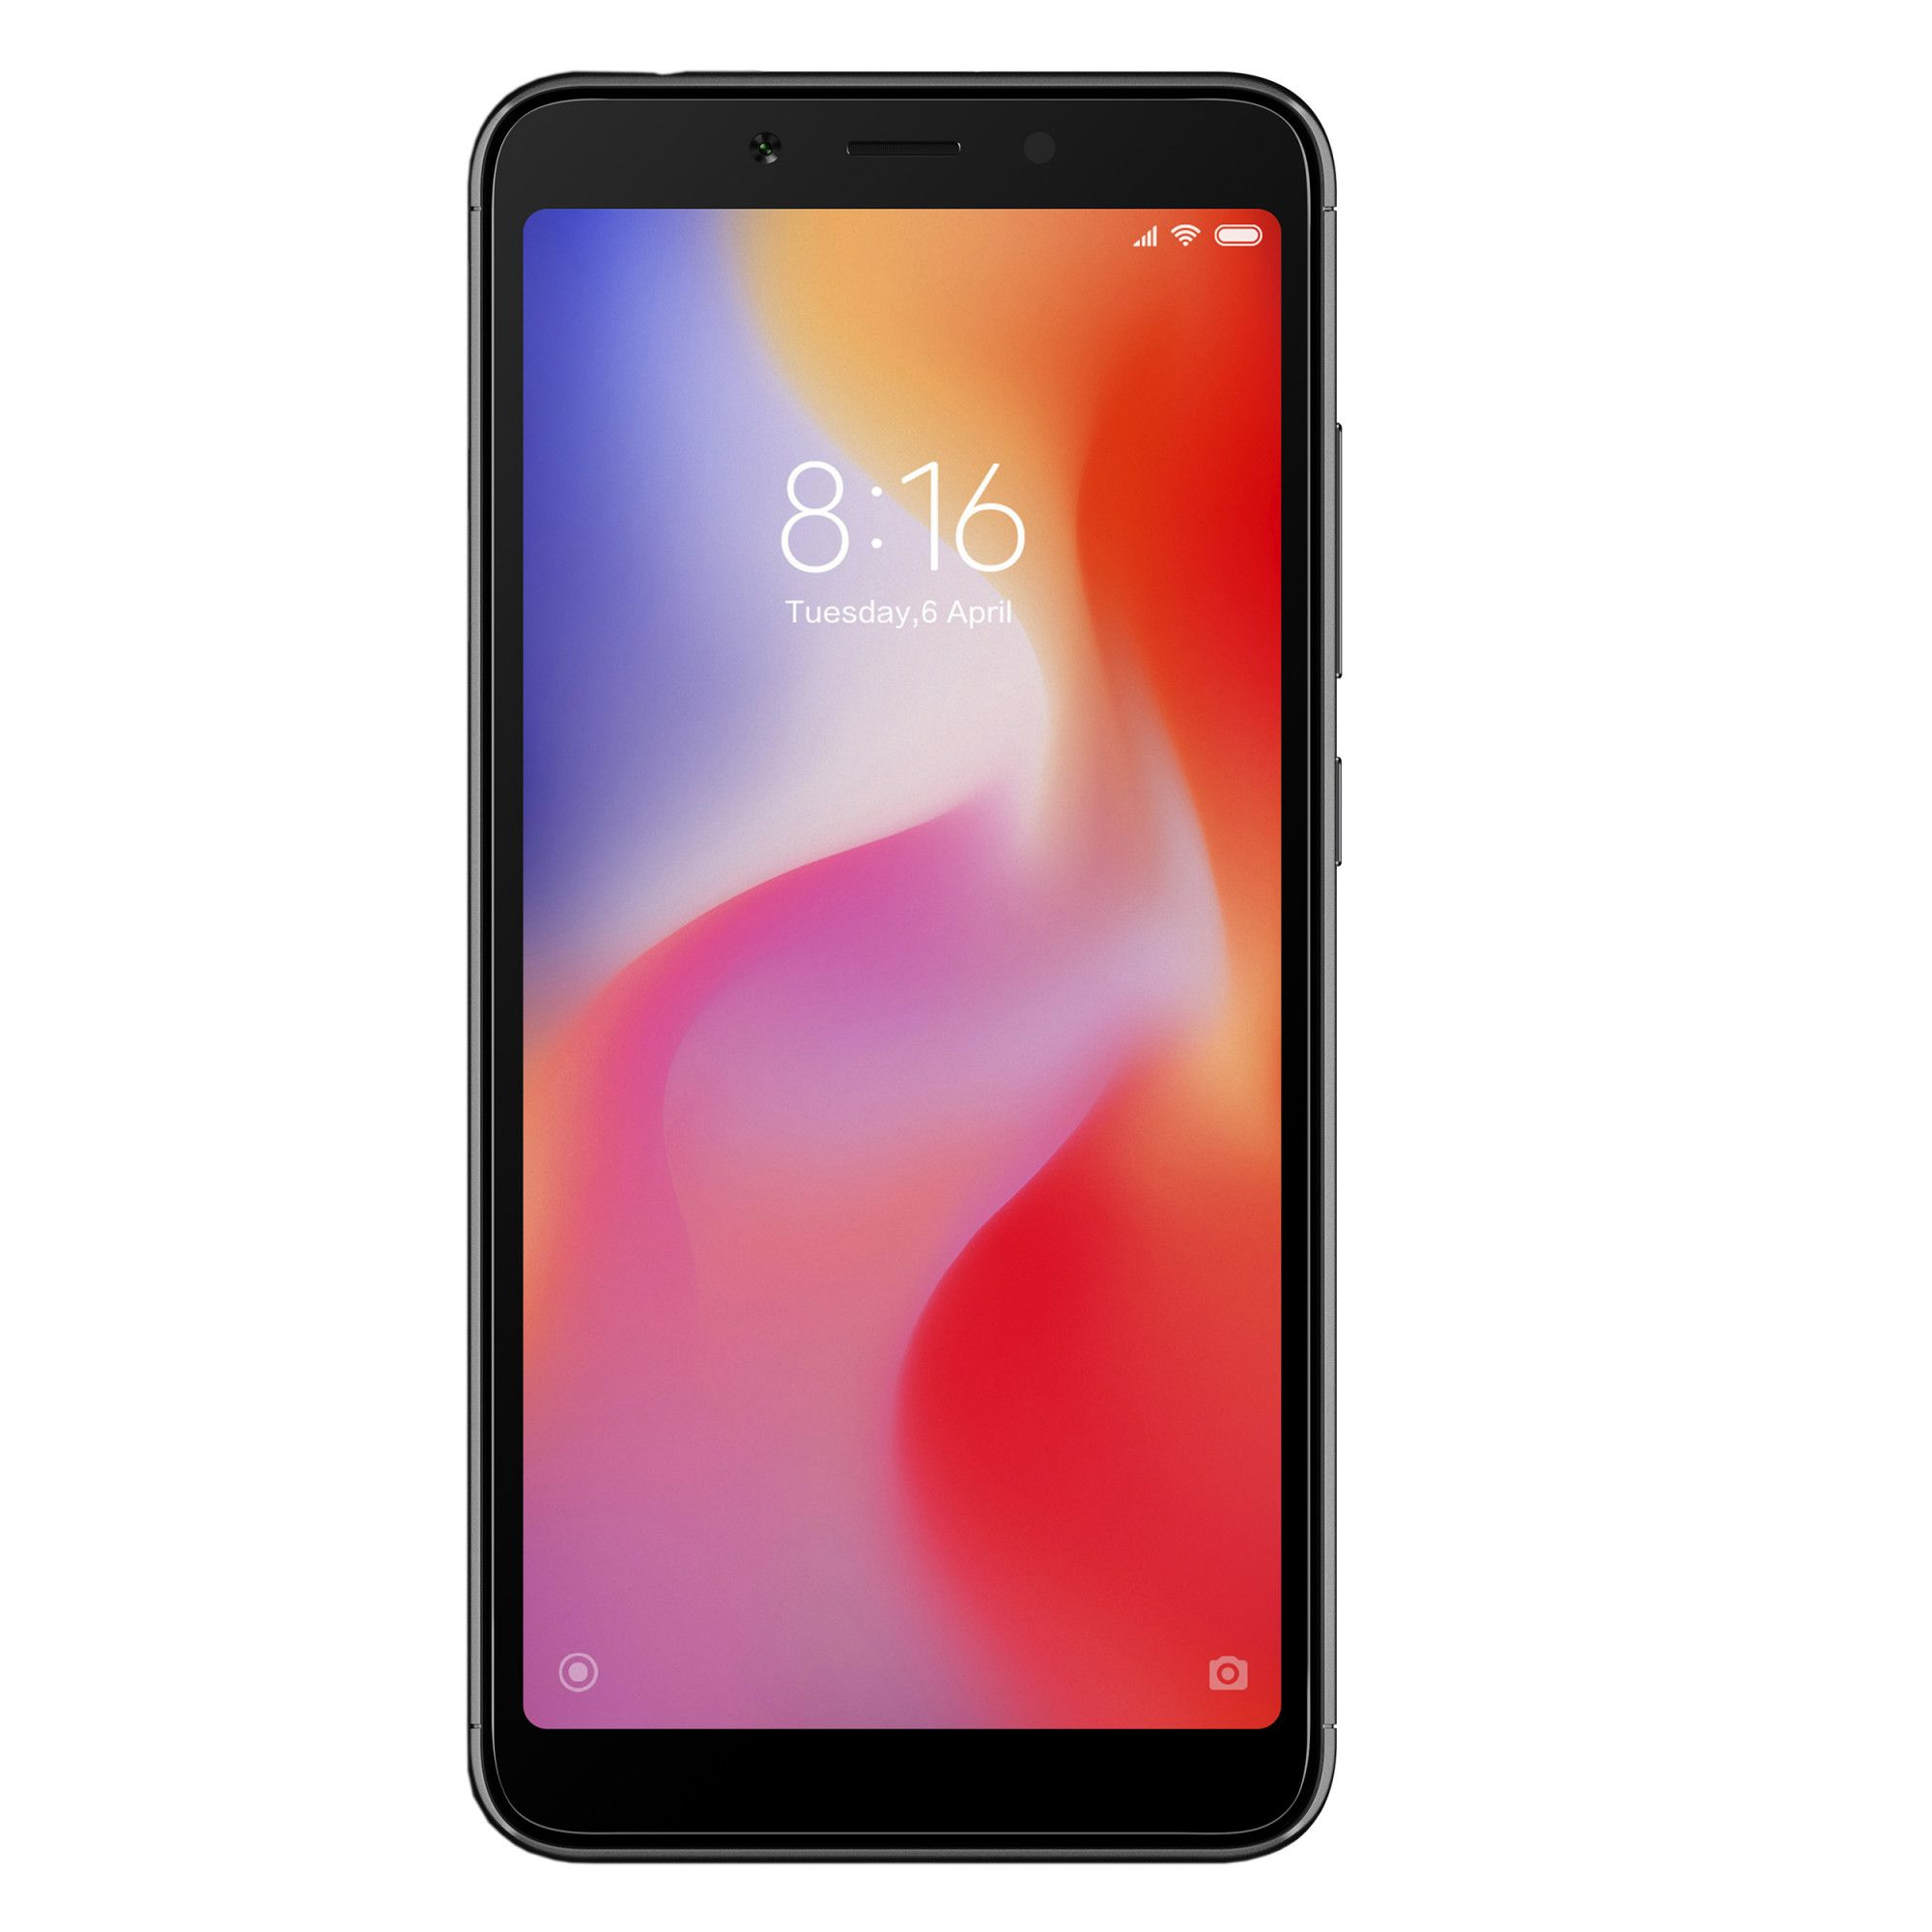 Telefon Mobil Xiaomi Redmi 6a 16GB Flash 2GB RAM Dual SIM 4G Black